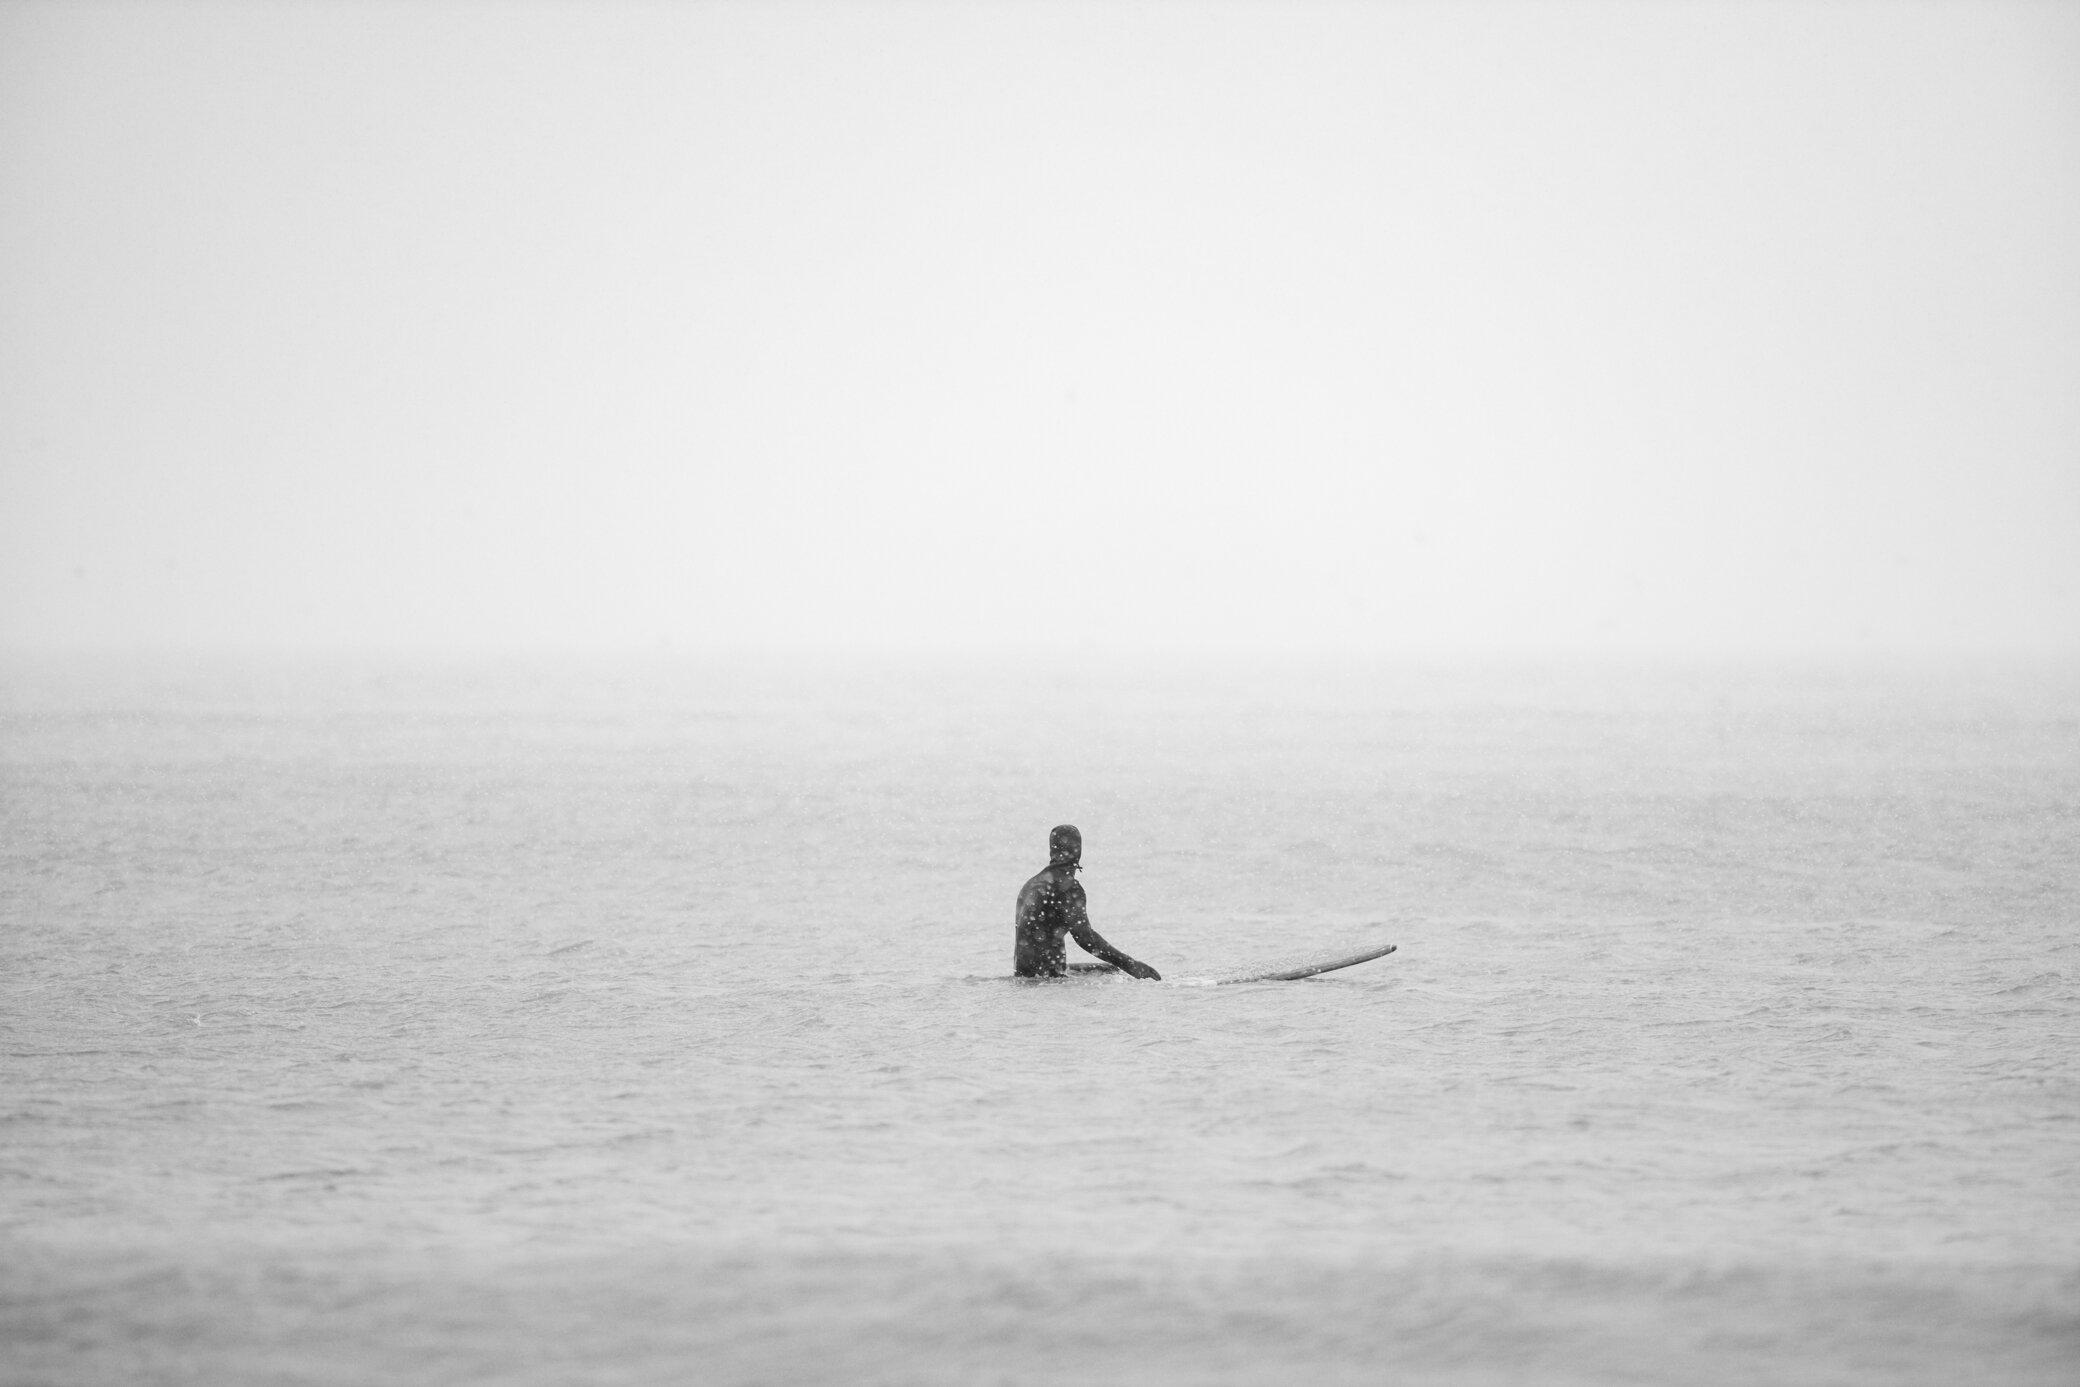 Surf10312019_7148_byAndrewFeller007.jpg